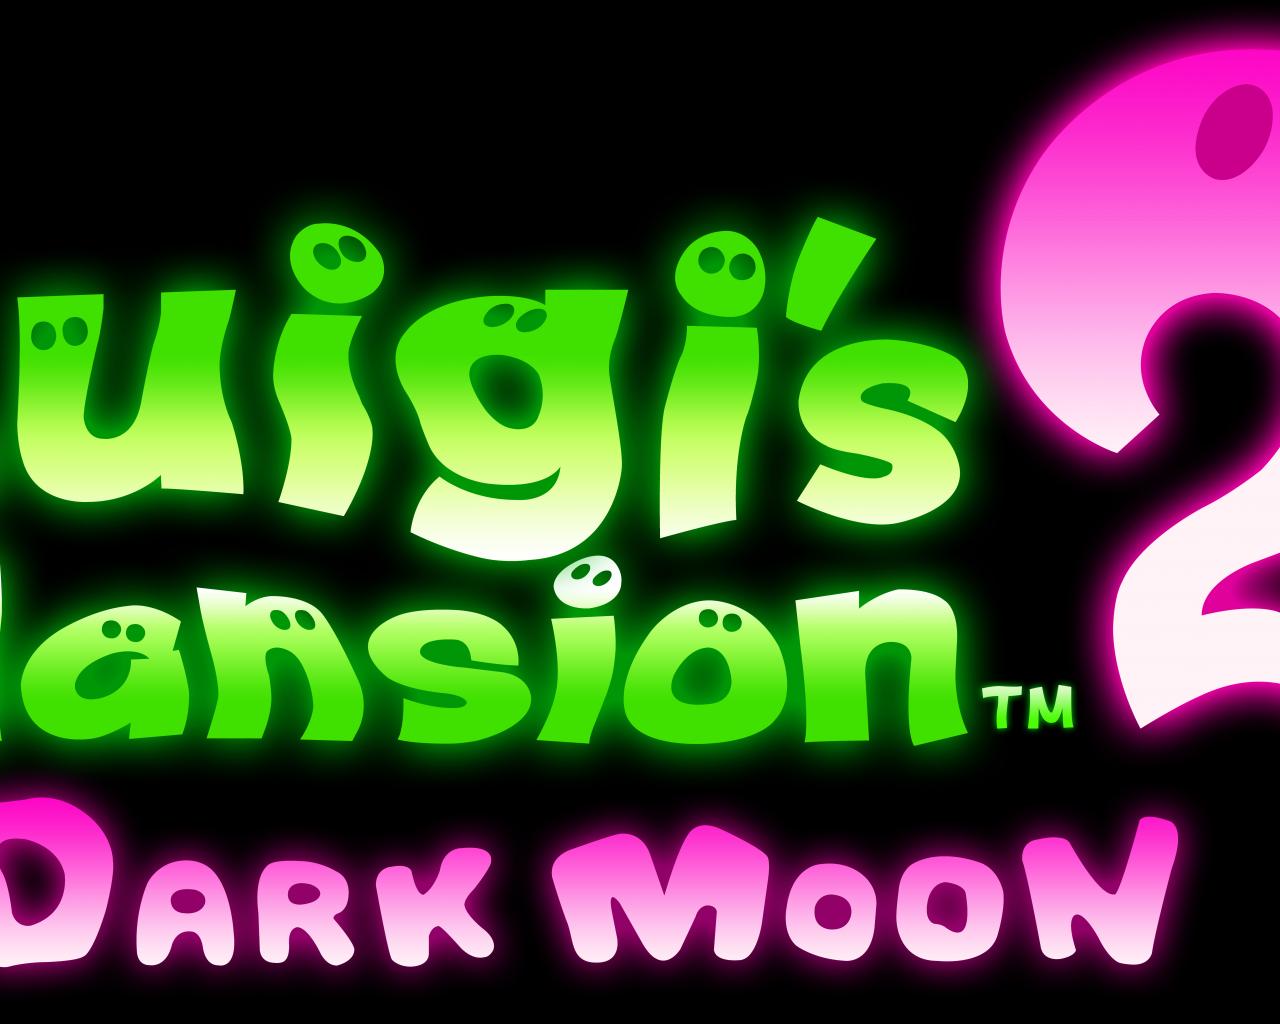 Free Download Luigi S Mansion 2 Dark Moon Logo Render By